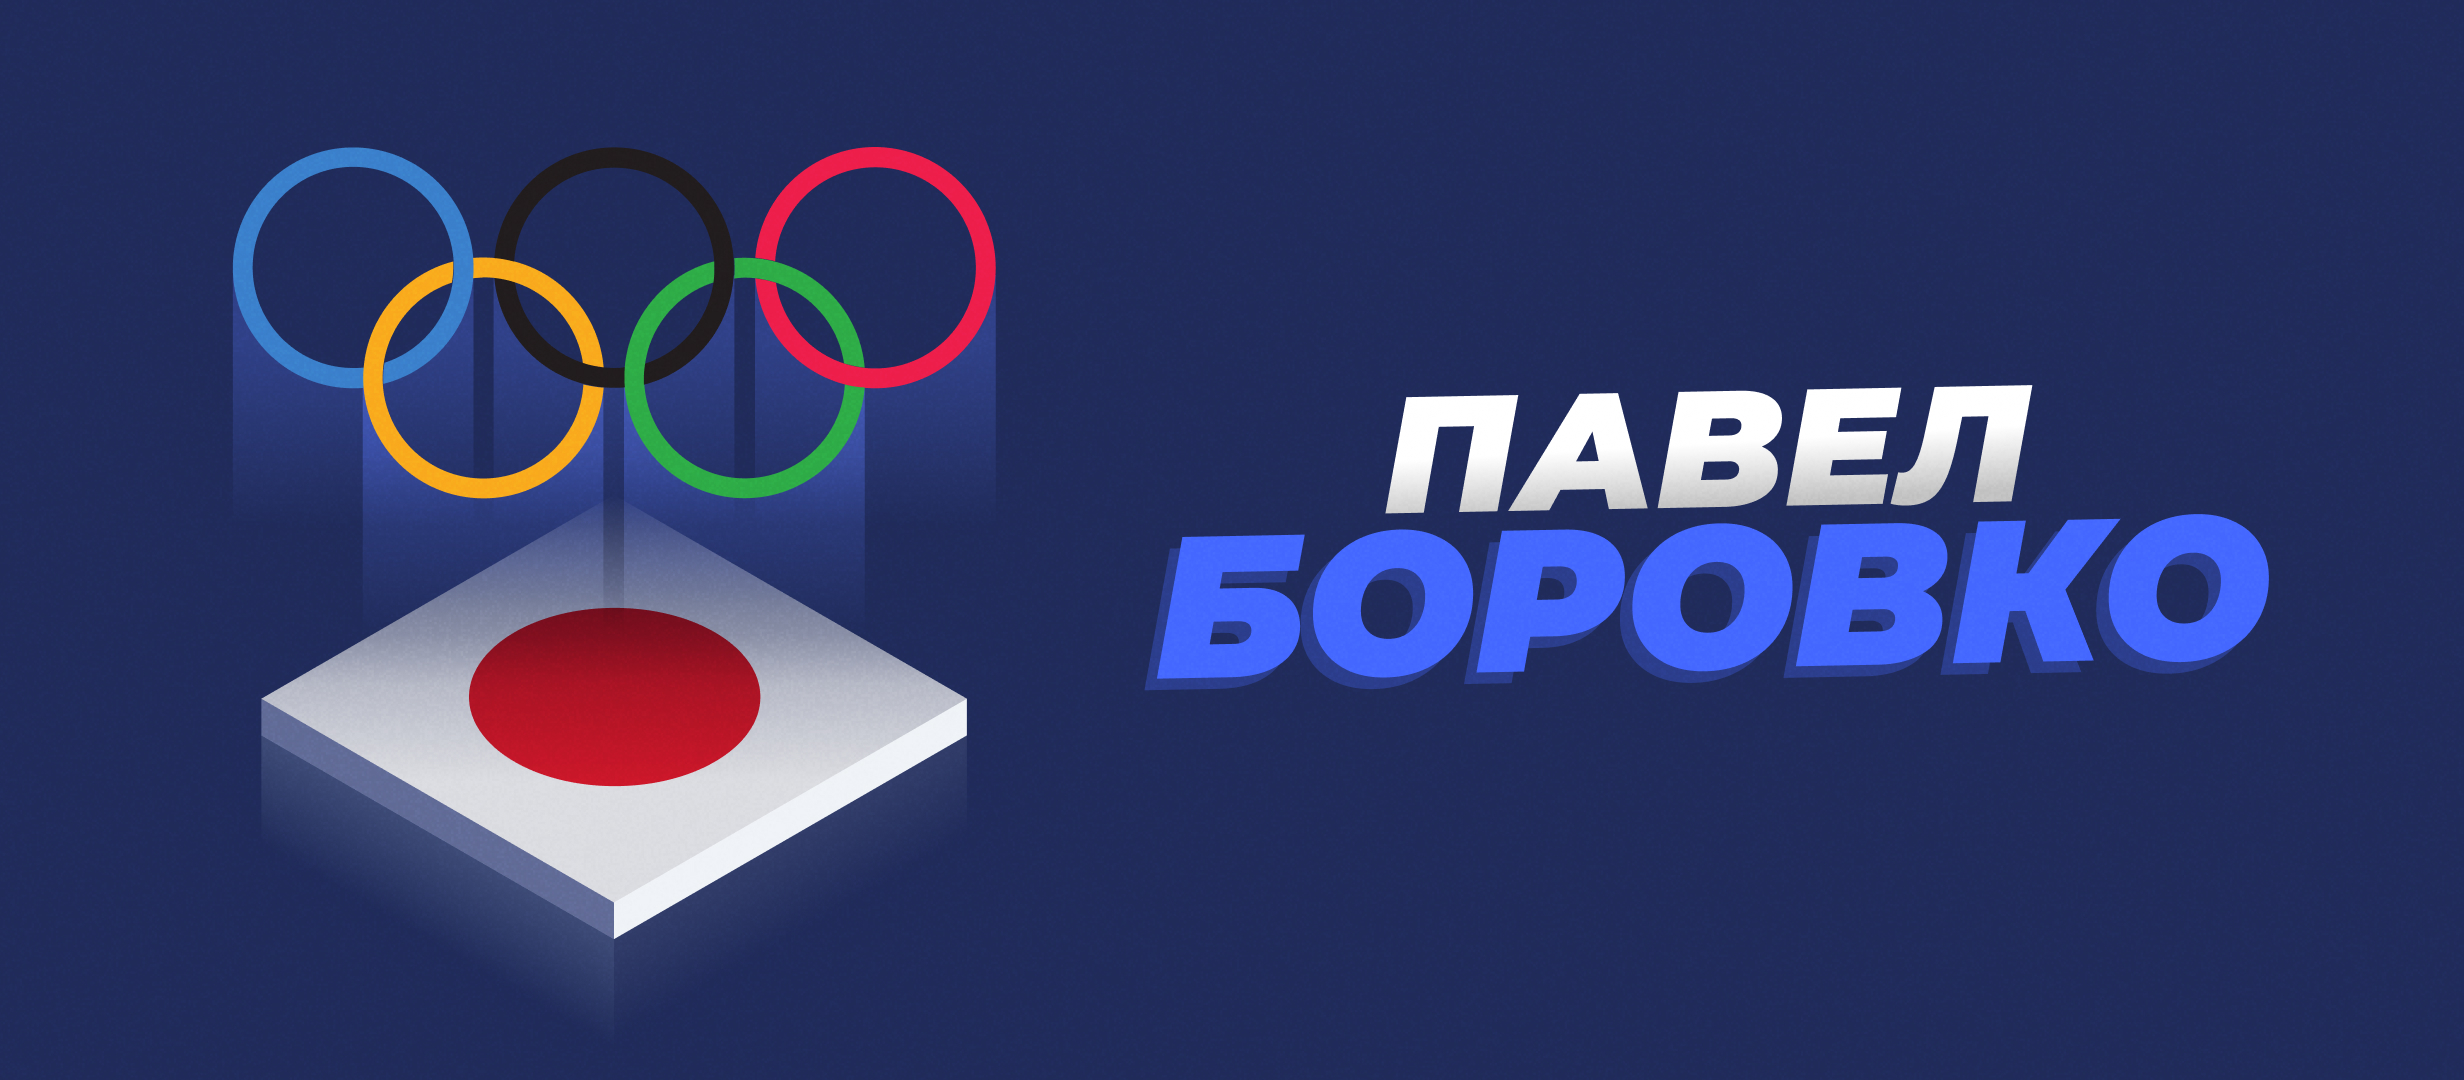 Олимпиада-2021: бейсбол, софтбол, водное поло, регби-7 и хоккей на траве